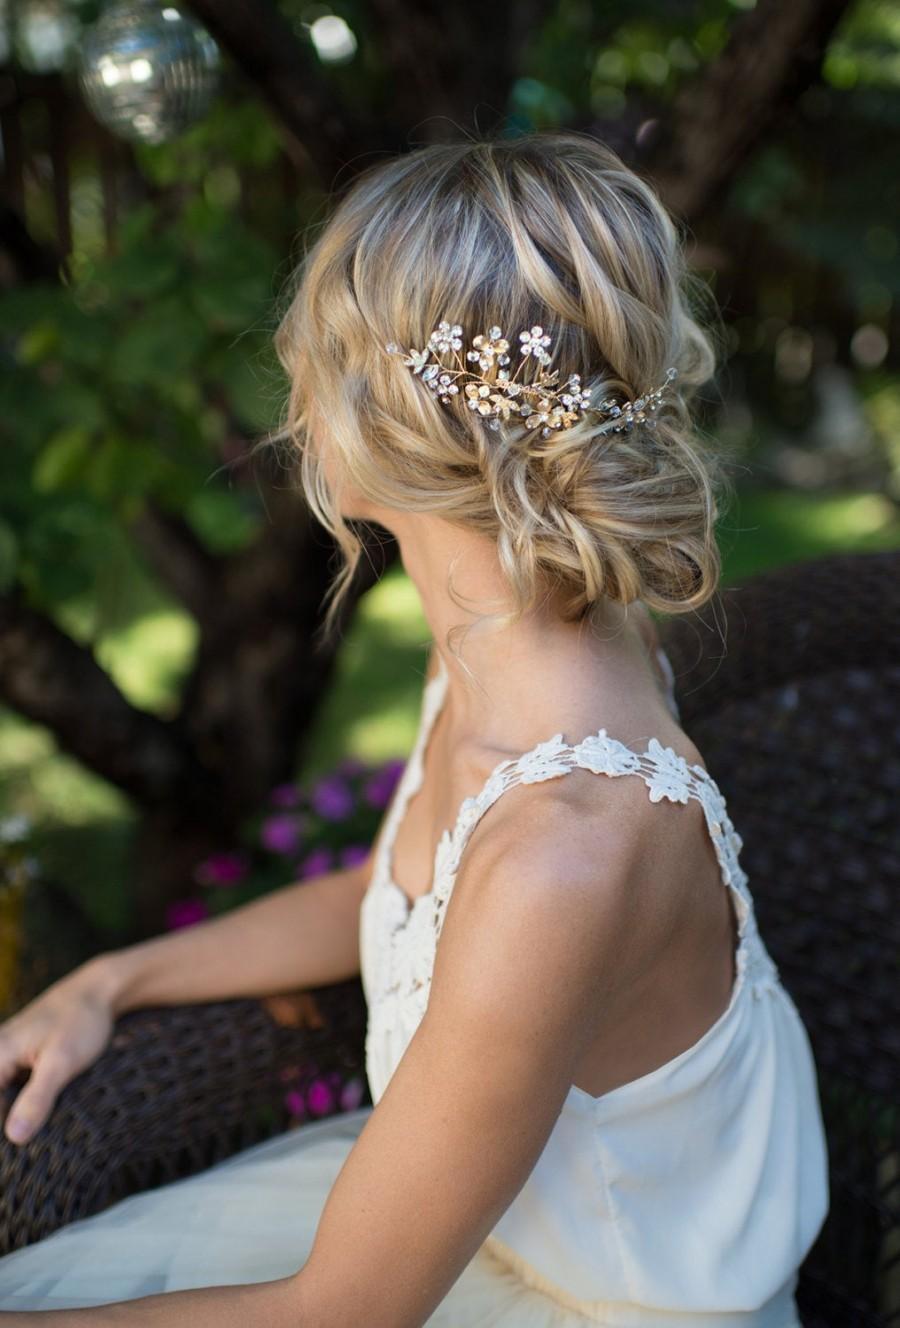 Mariage - Boho Flower Leaf Hair Accessory Comb, Bridal Hair comb, Boho Wedding Gold Hair vine leaves, Boho Headpiece - 'SABLE'